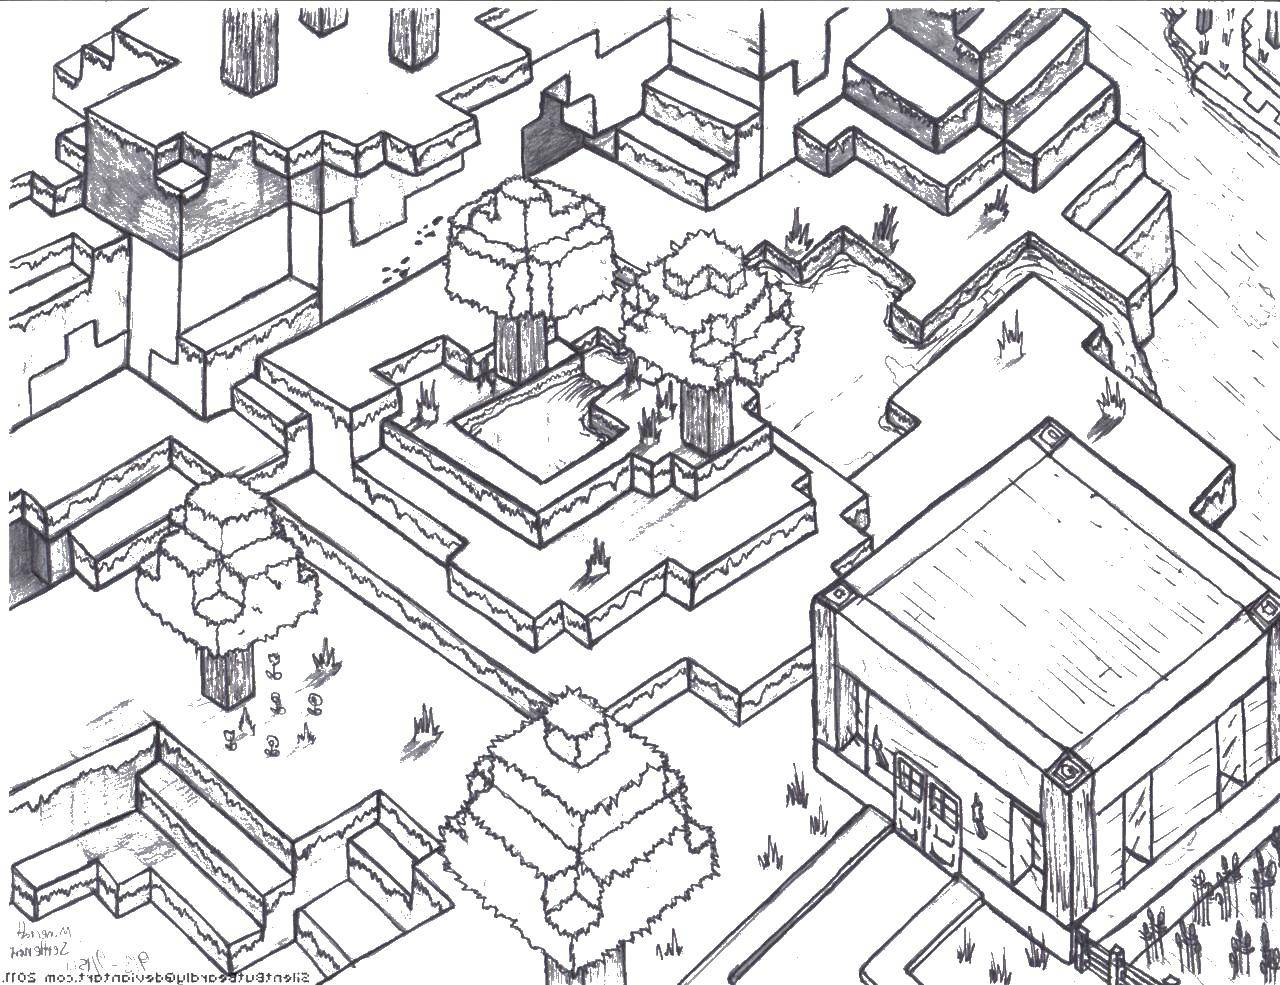 Раскраска Майнкрафт город Скачать майнкрафт, город.  Распечатать ,майнкрафт,